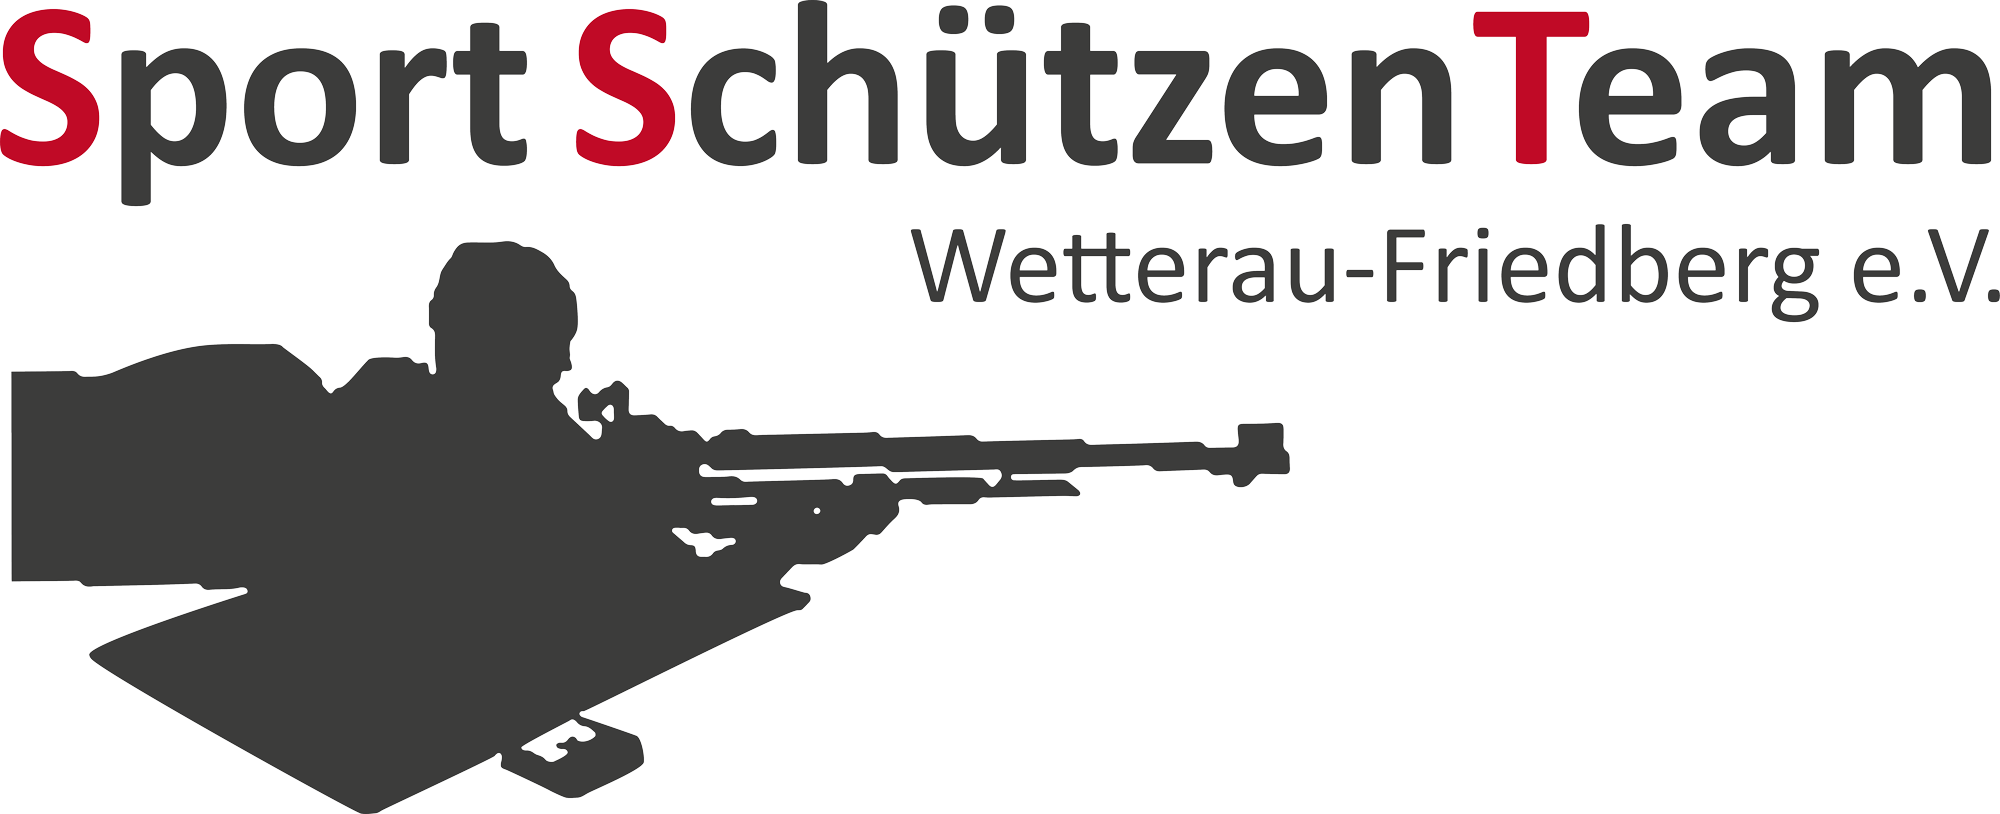 Logo SportSchützenTeam Wetterau-Friedberg e.V.